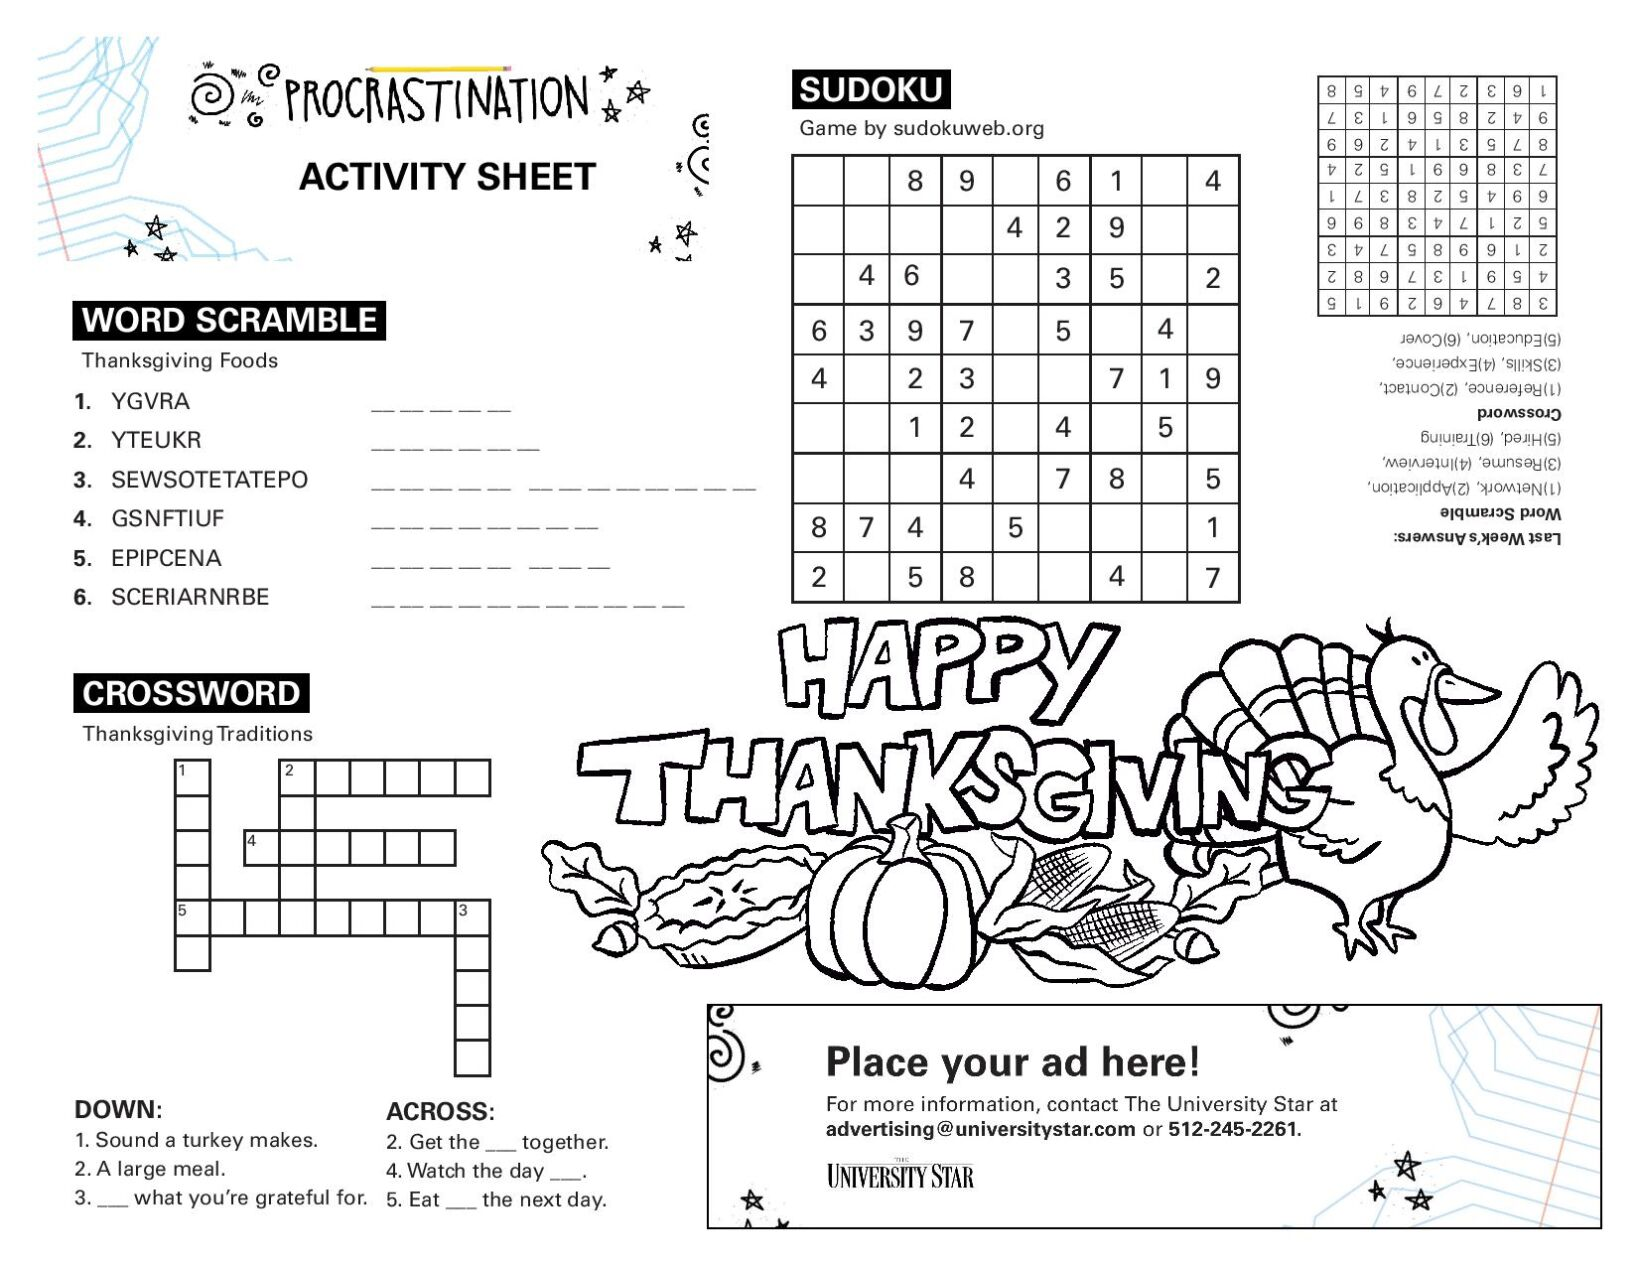 11/24 printable activity sheet.